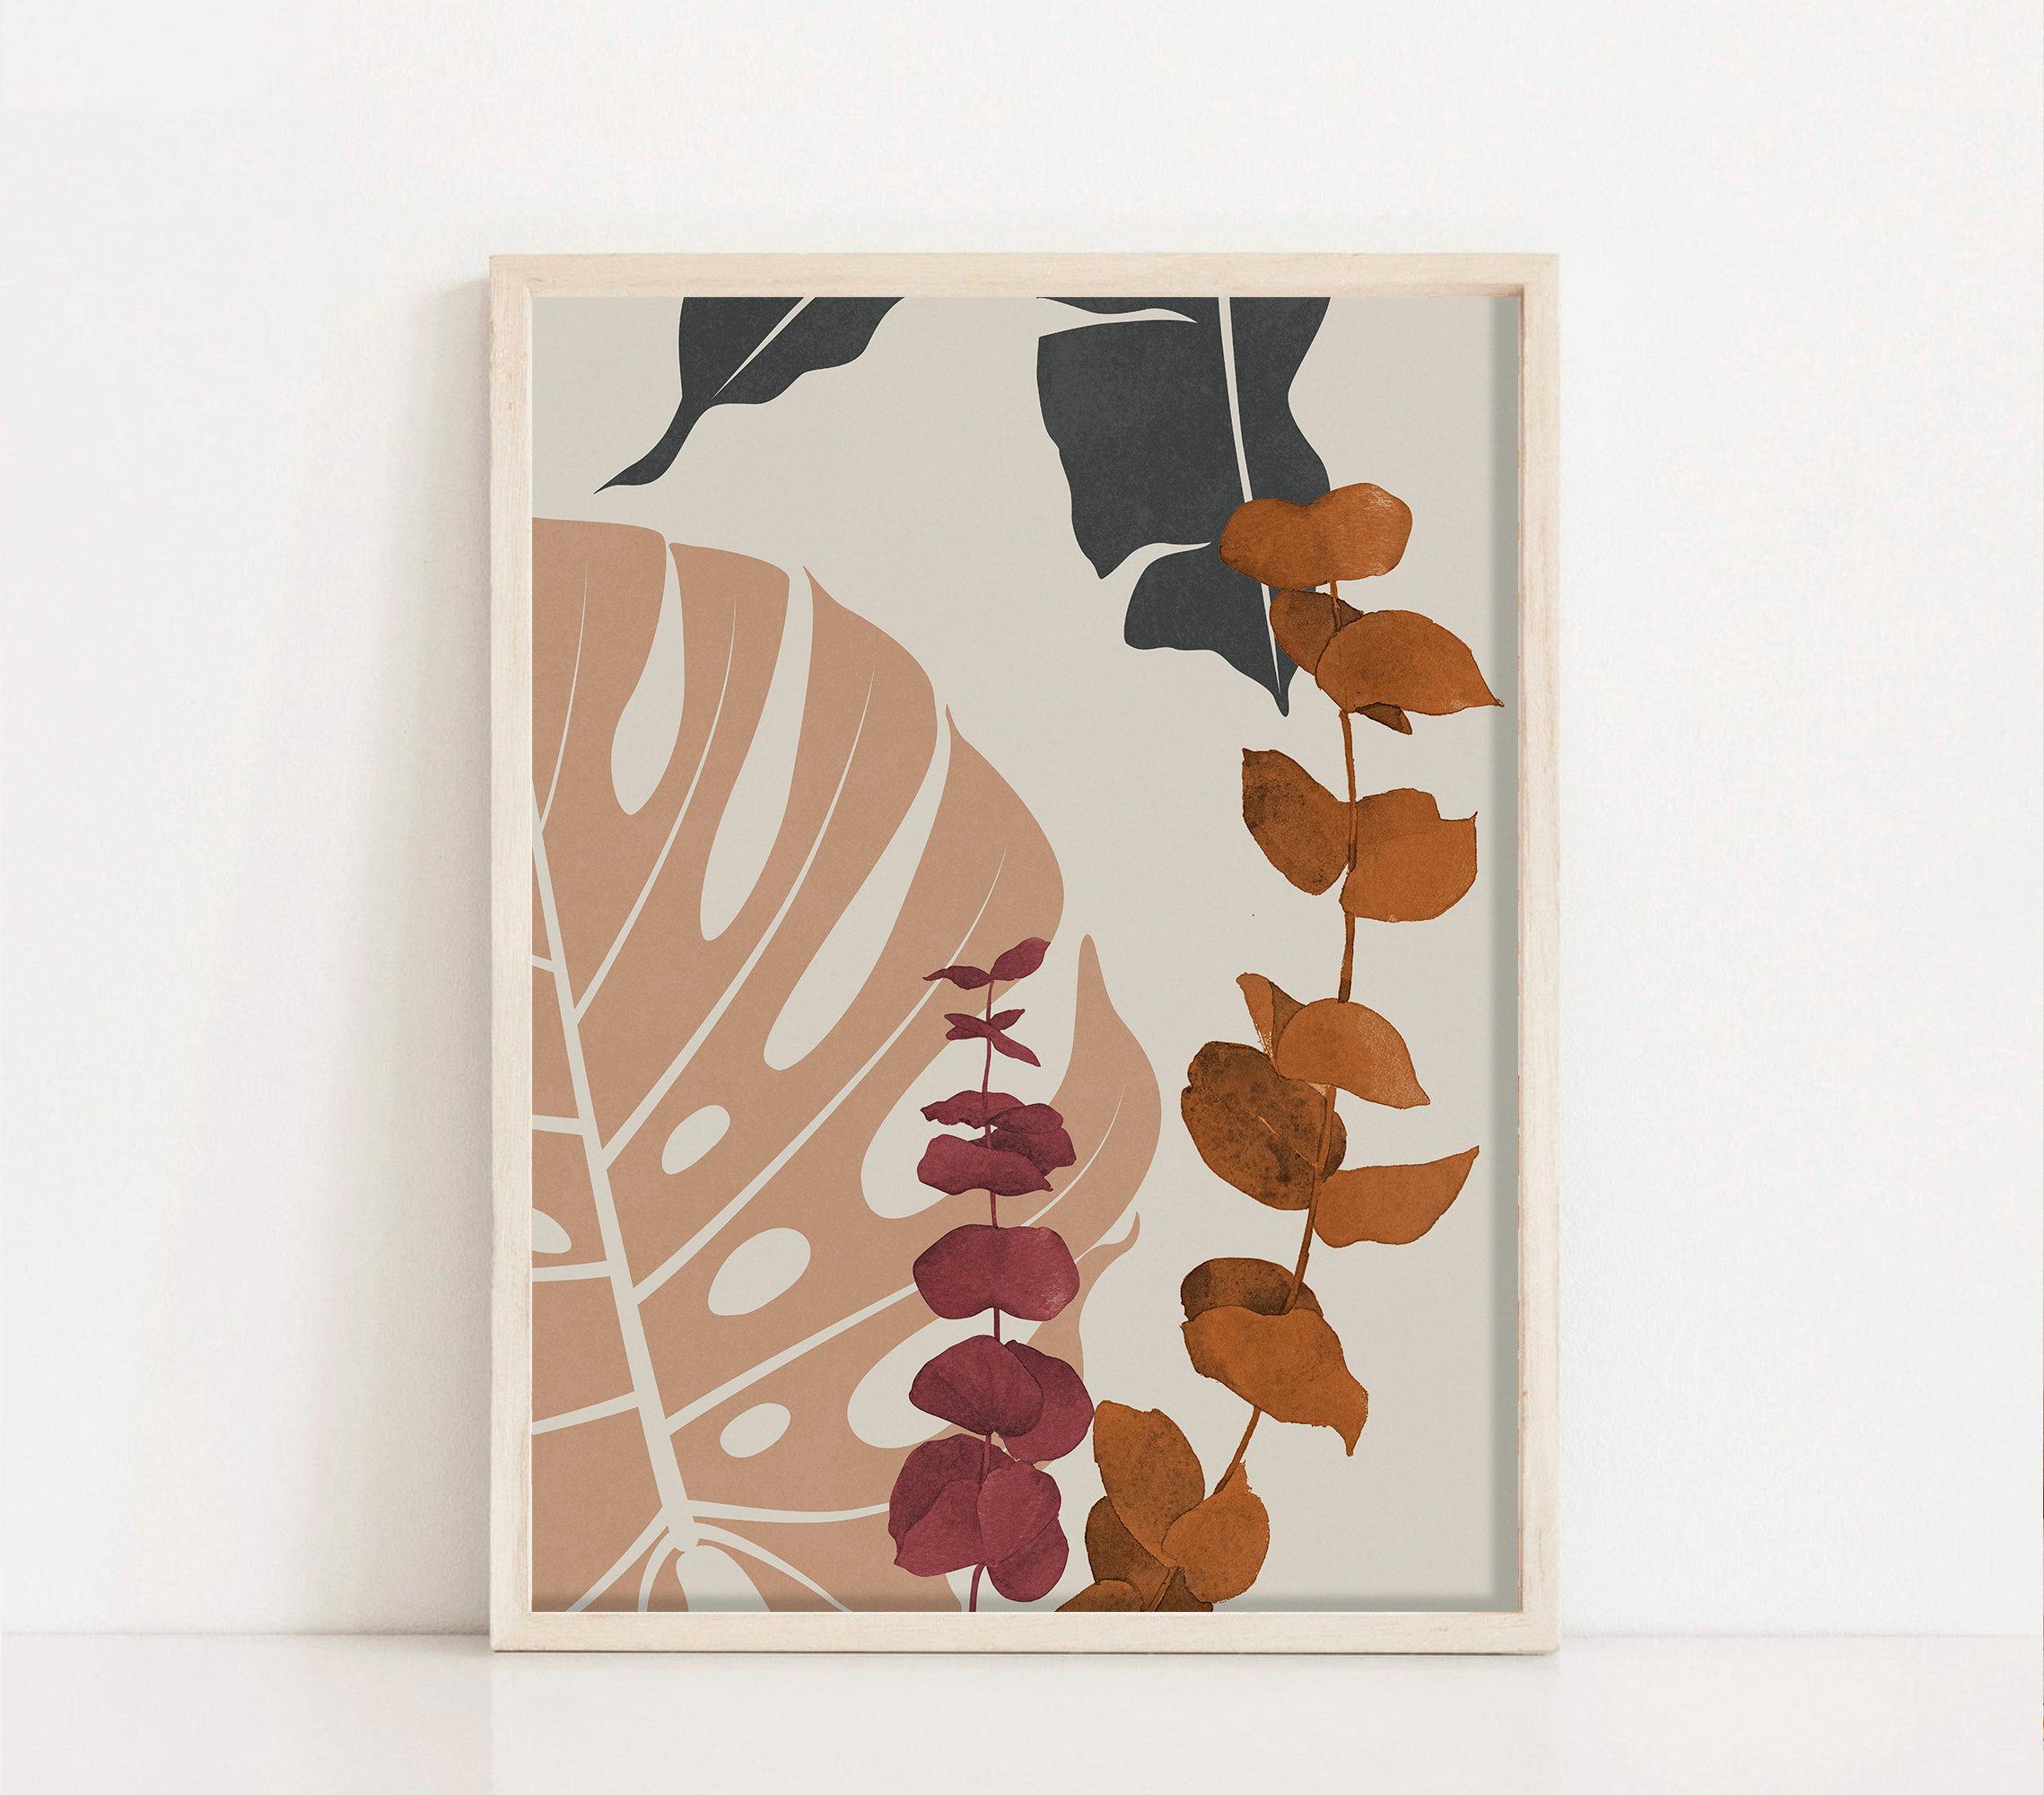 Boho Botanical Art Print, Printable Wall Art, Boho Wall Decor, Terracotta  Flower Wall Art, Floral Wall Art, Abstract Botanical Prints